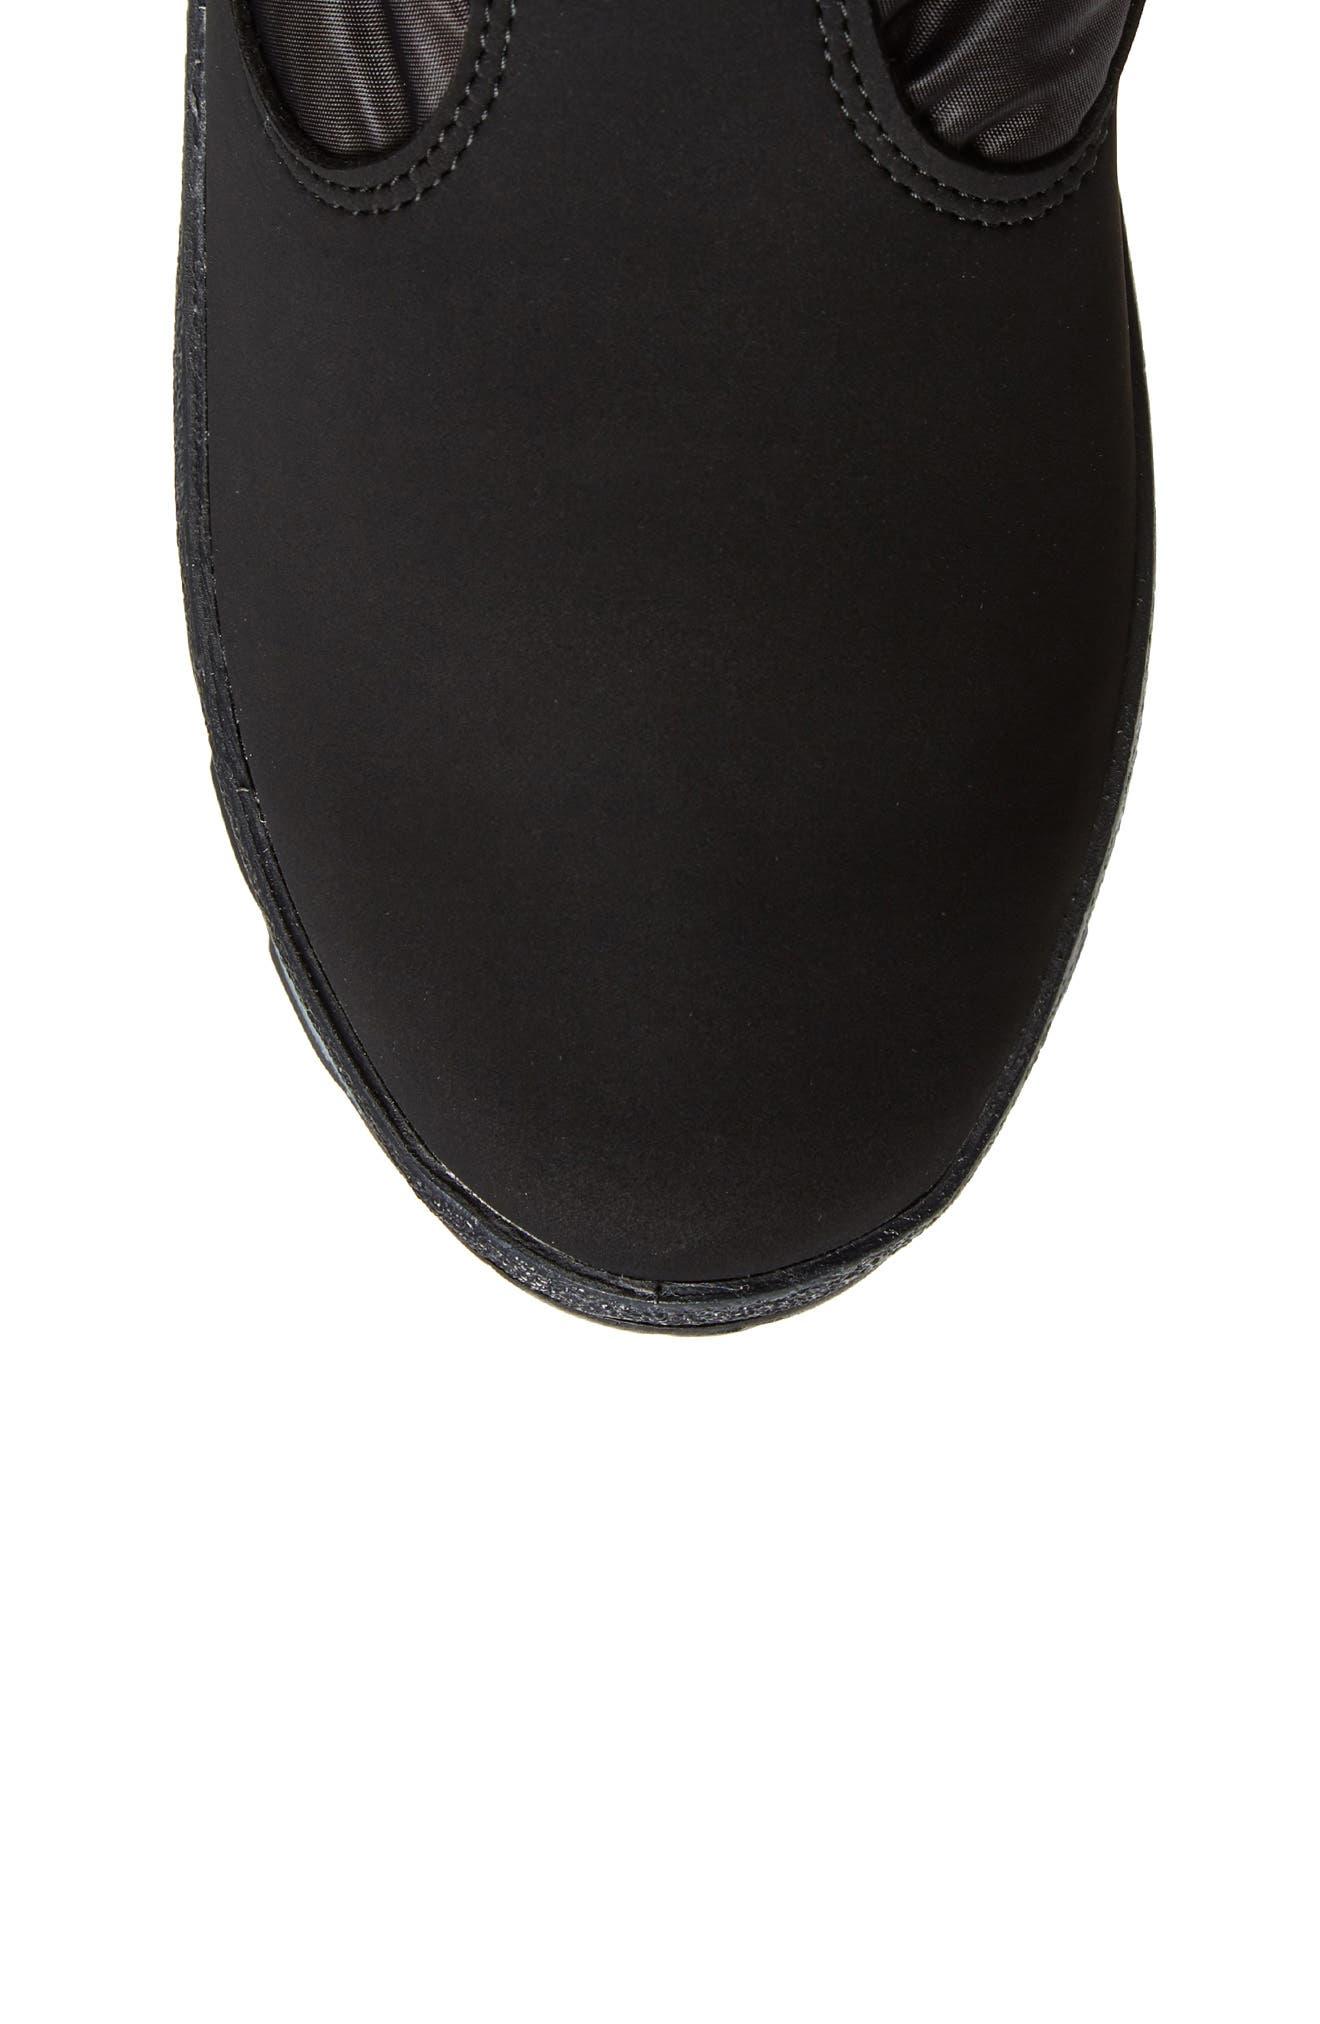 St. Anton Waterproof Winter Boot,                             Alternate thumbnail 5, color,                             BLACK/ ANTHRACITE